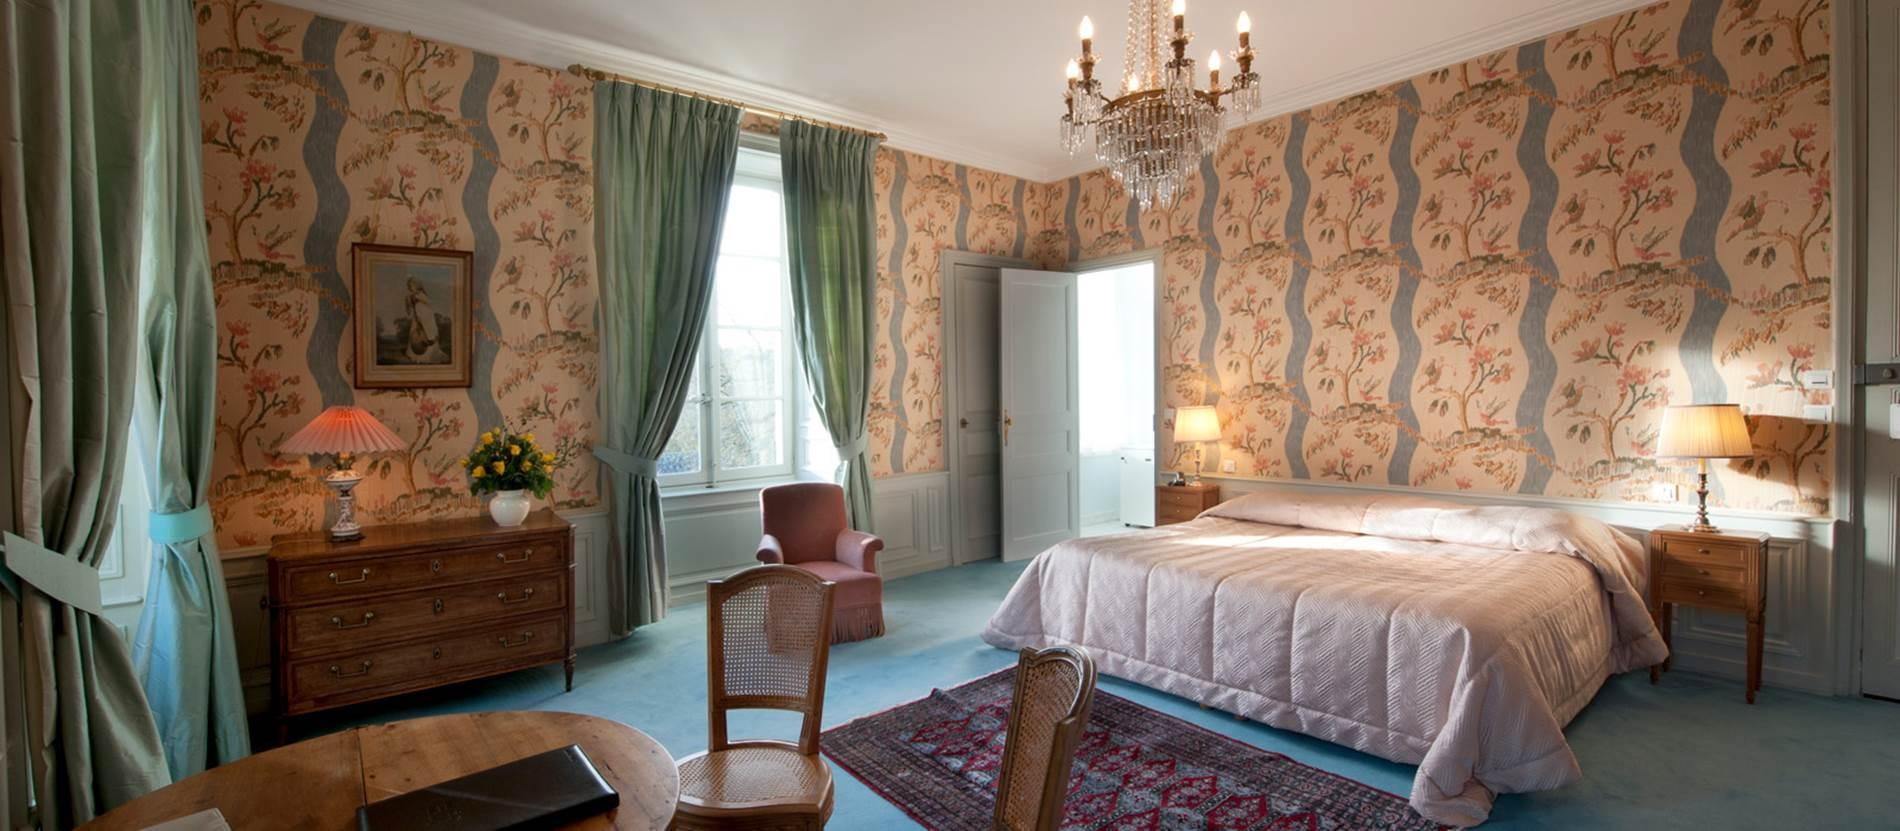 Hôtel-Chateau-Locguénolé-Kervignac-Morbihan-Bretagne-Sud © Hôtel-Chateau-Locguénolé-Kervignac